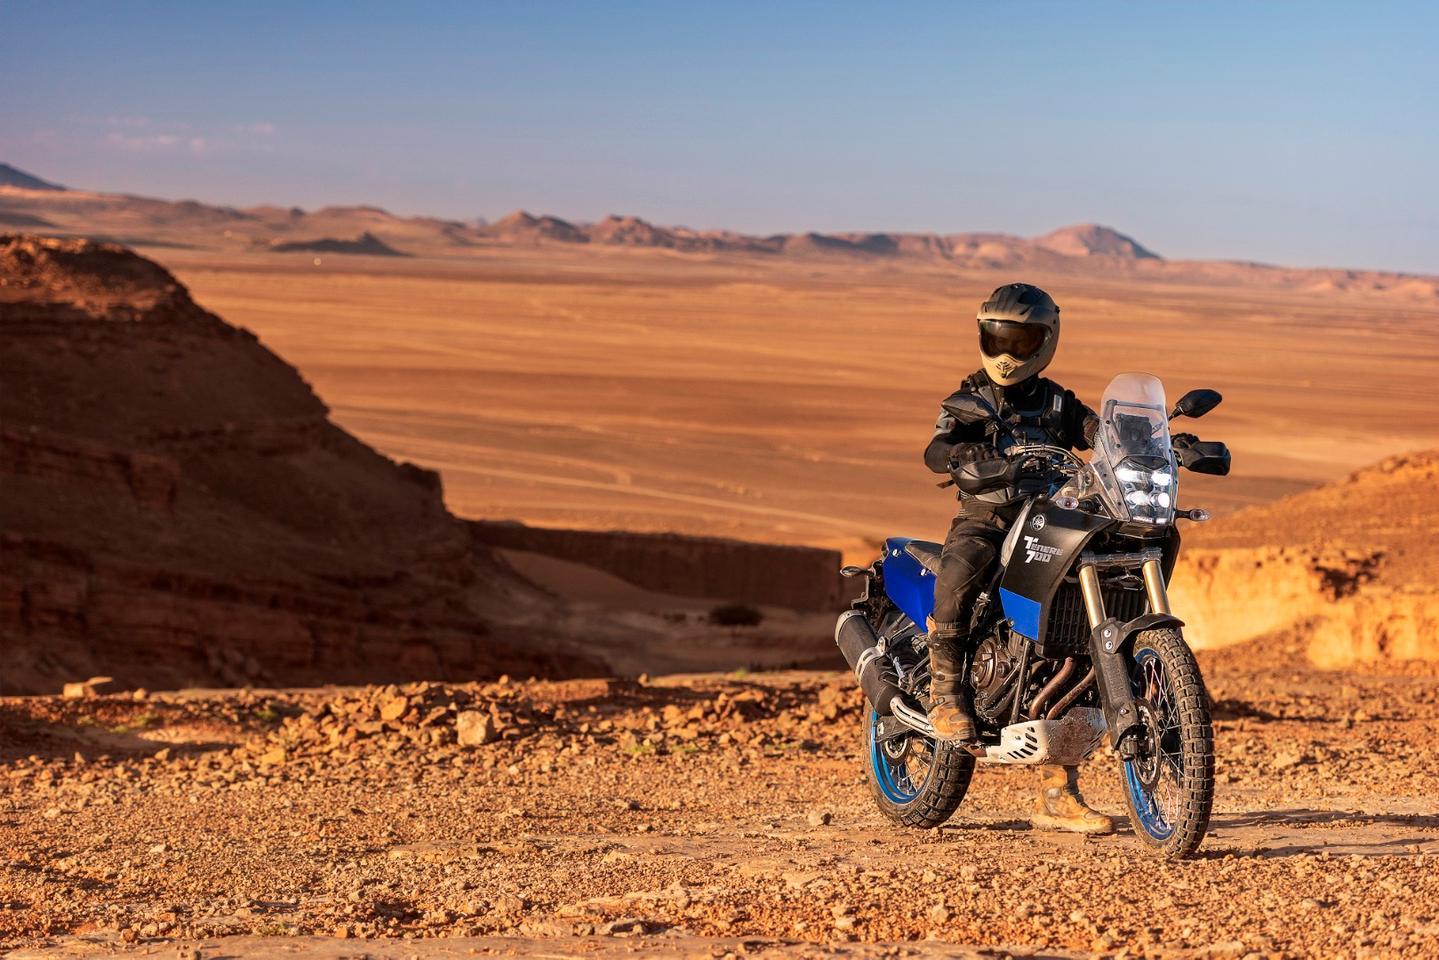 Yamaha Ténéré 700: a relatively basic –and thushopefullyaffordable –rally-style middleweight adventure machine